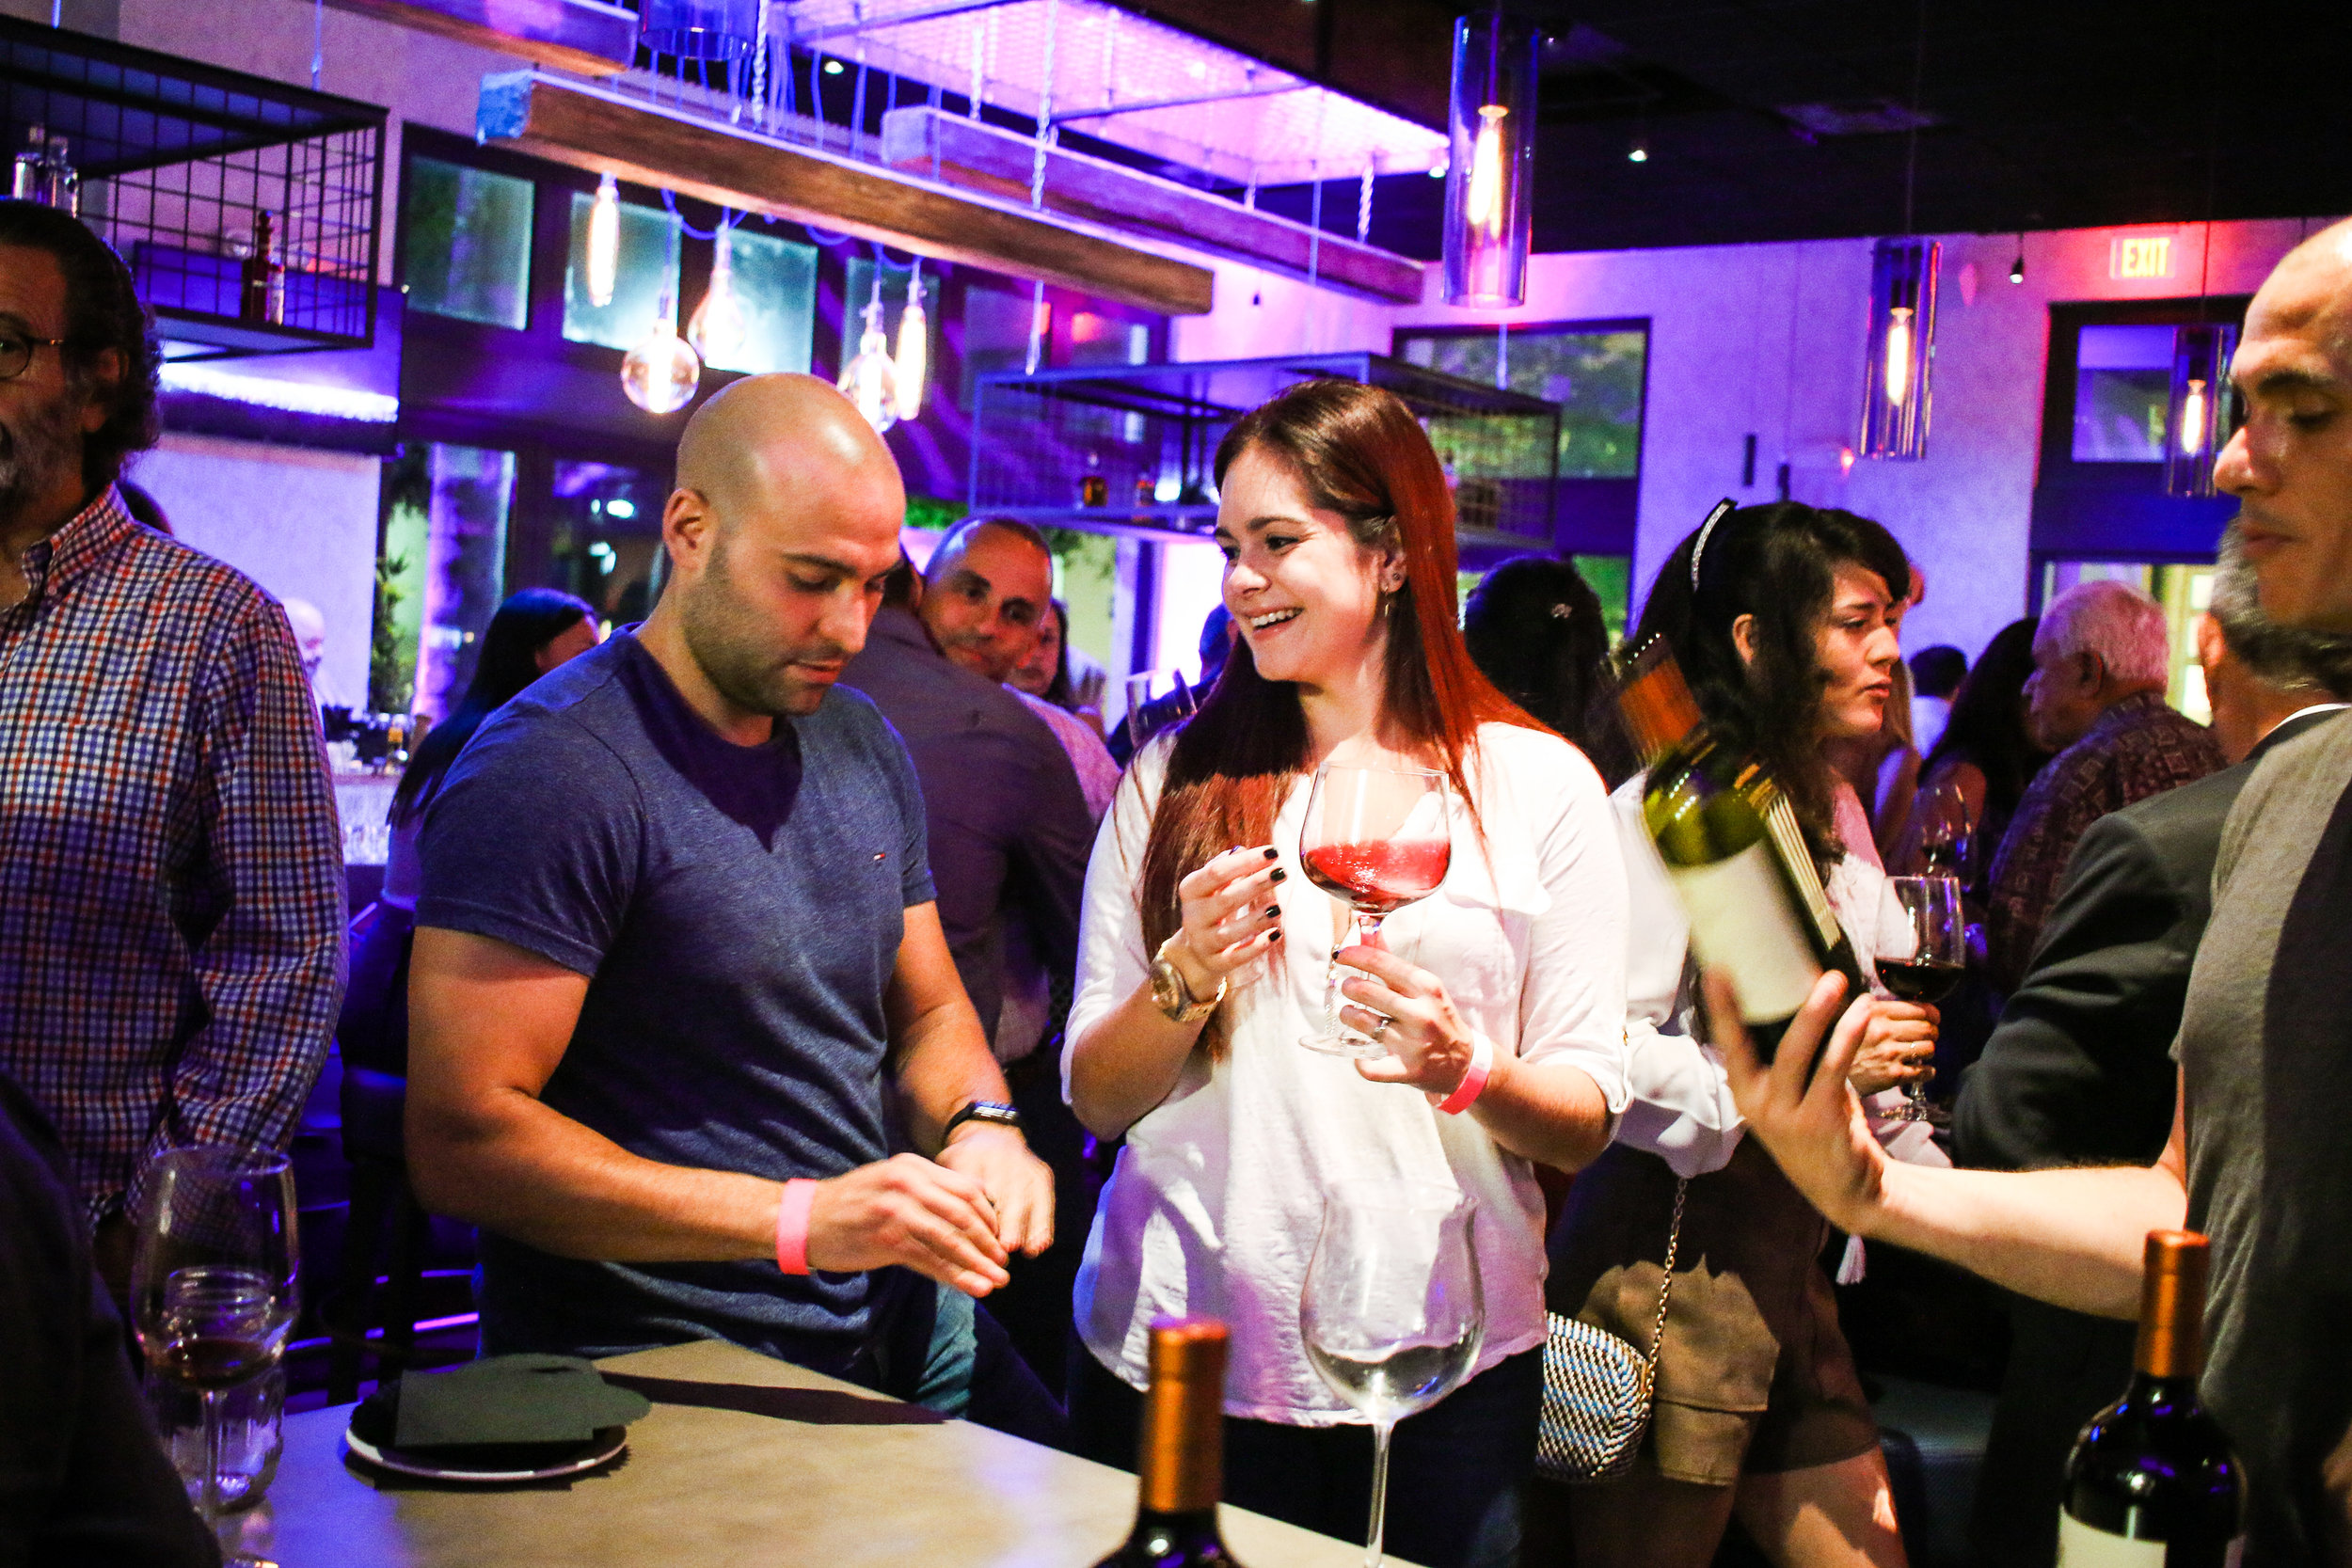 Cork & Fork-320 Gastrolounge-Miami Wine Events-Wine Tasting Miami-38.jpg